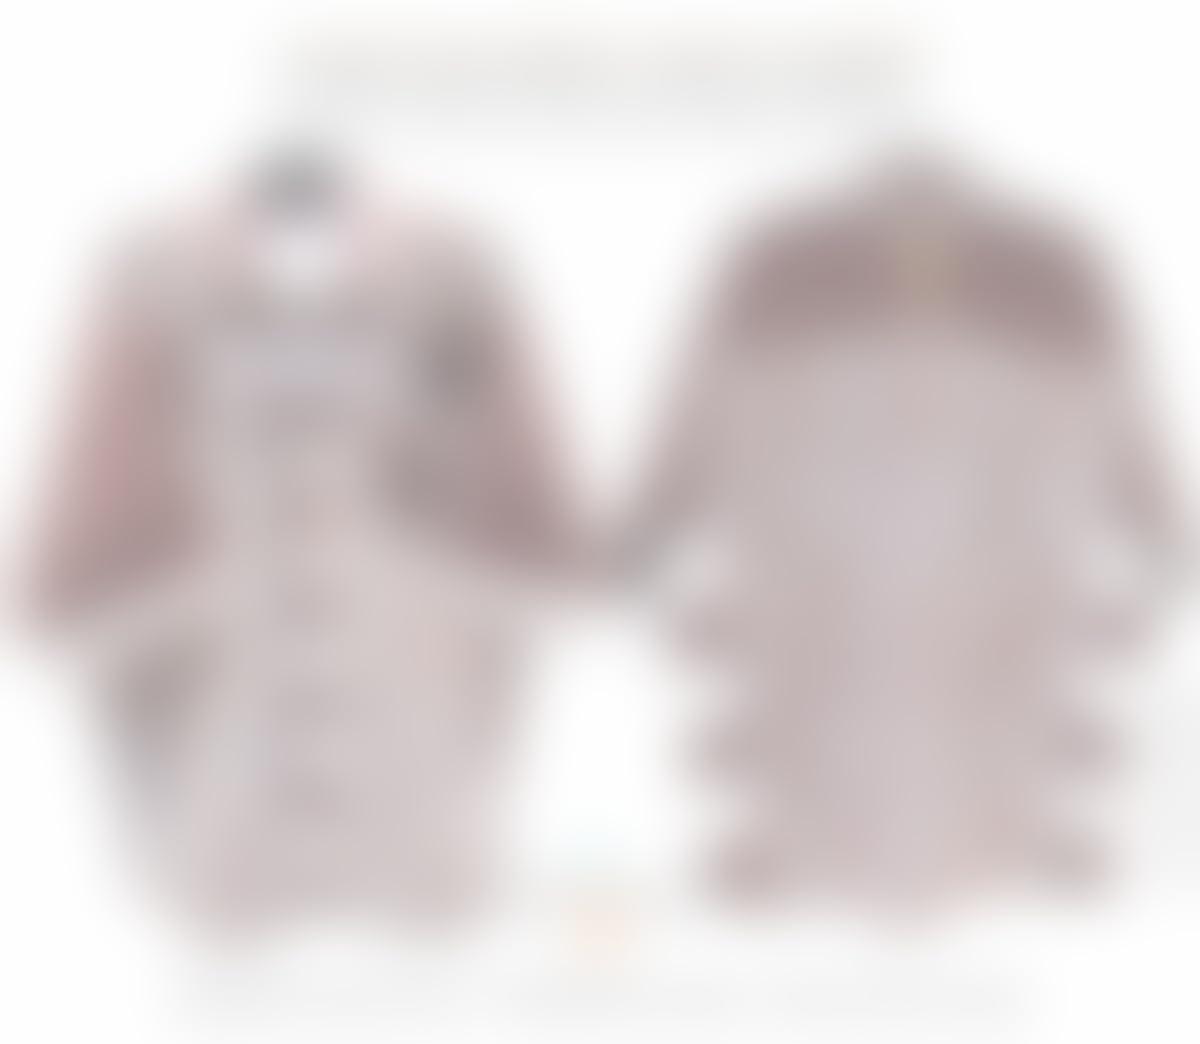 Amazon.com: Cheetah Print Mens Shirt   XXL Shirt   Big Wild Cat   Brown White Patchwork   Animal Print   Button-up Shirt by Hamlet Pericles   S111212: ...